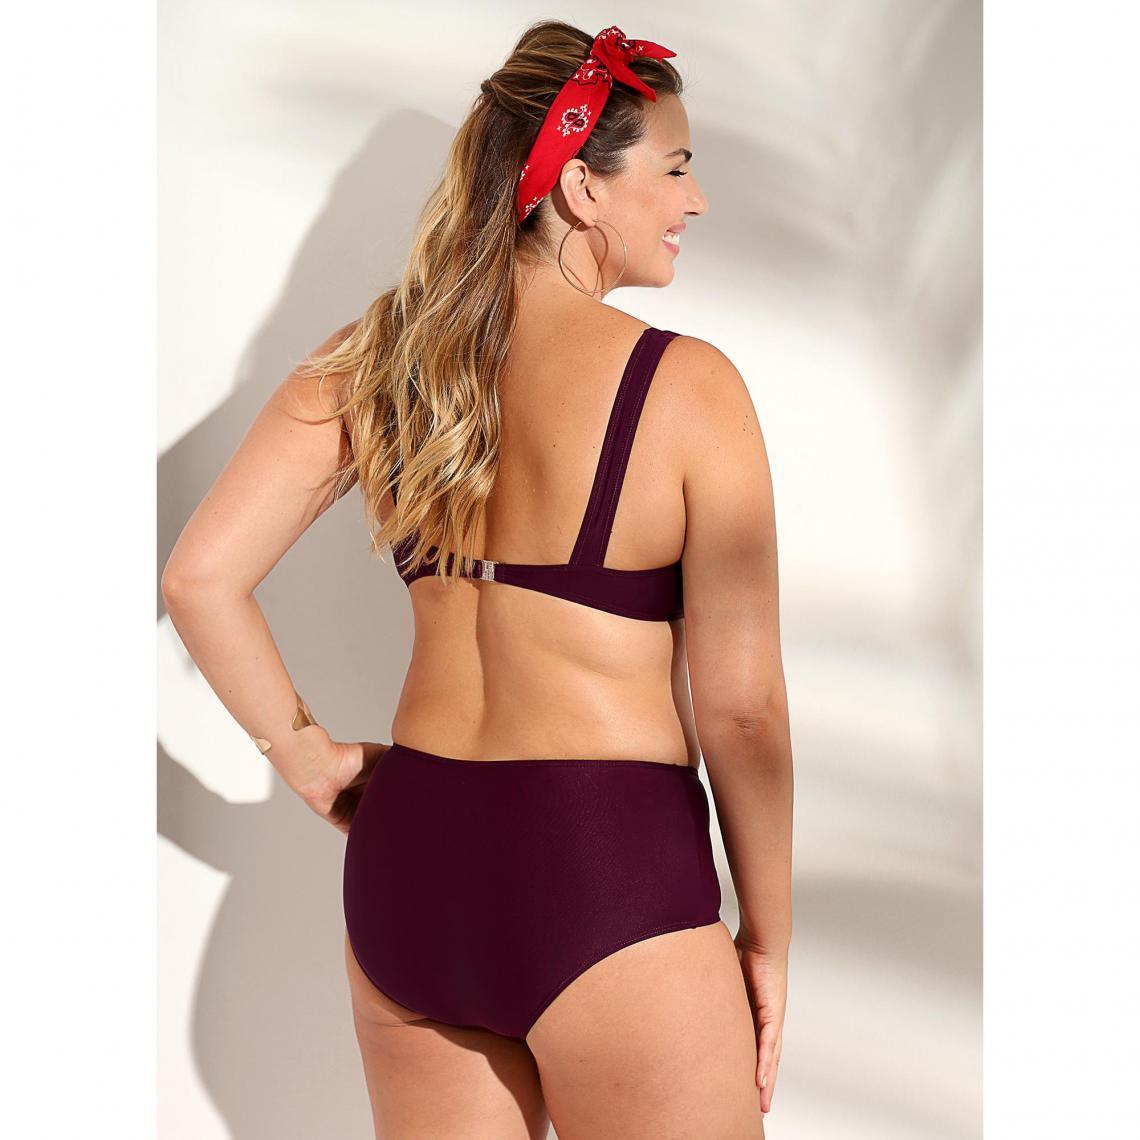 62f96fa584 Bikini uni à armatures culotte ventre plat femme - Lilas | 3 SUISSES